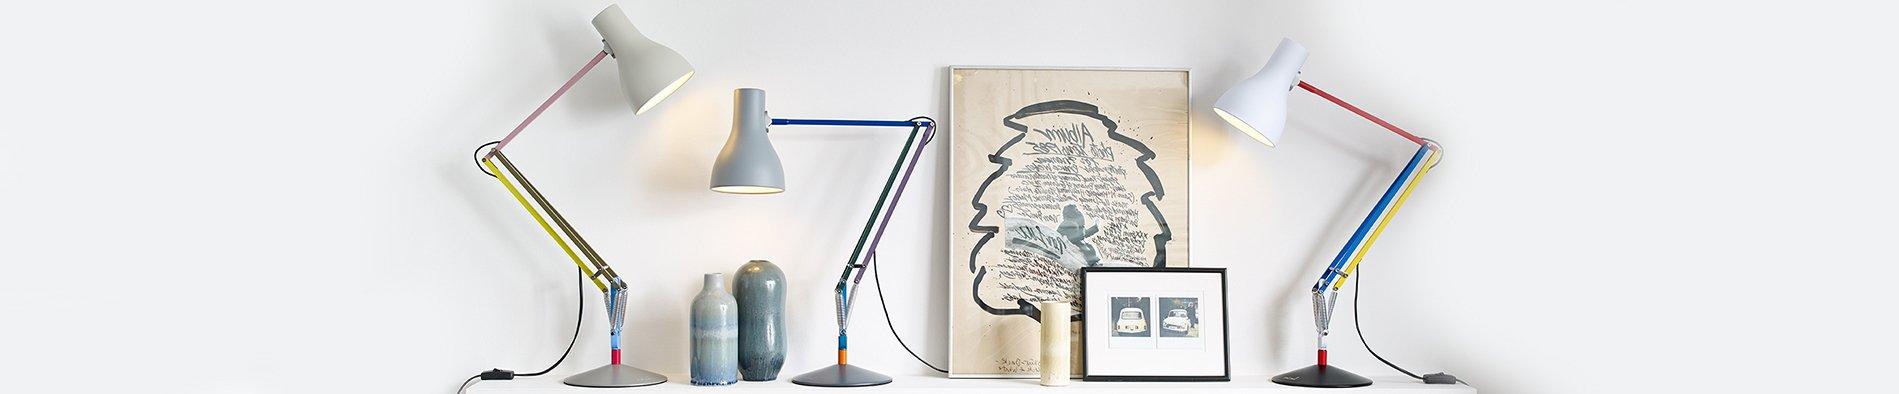 Anglepoise wandlampen